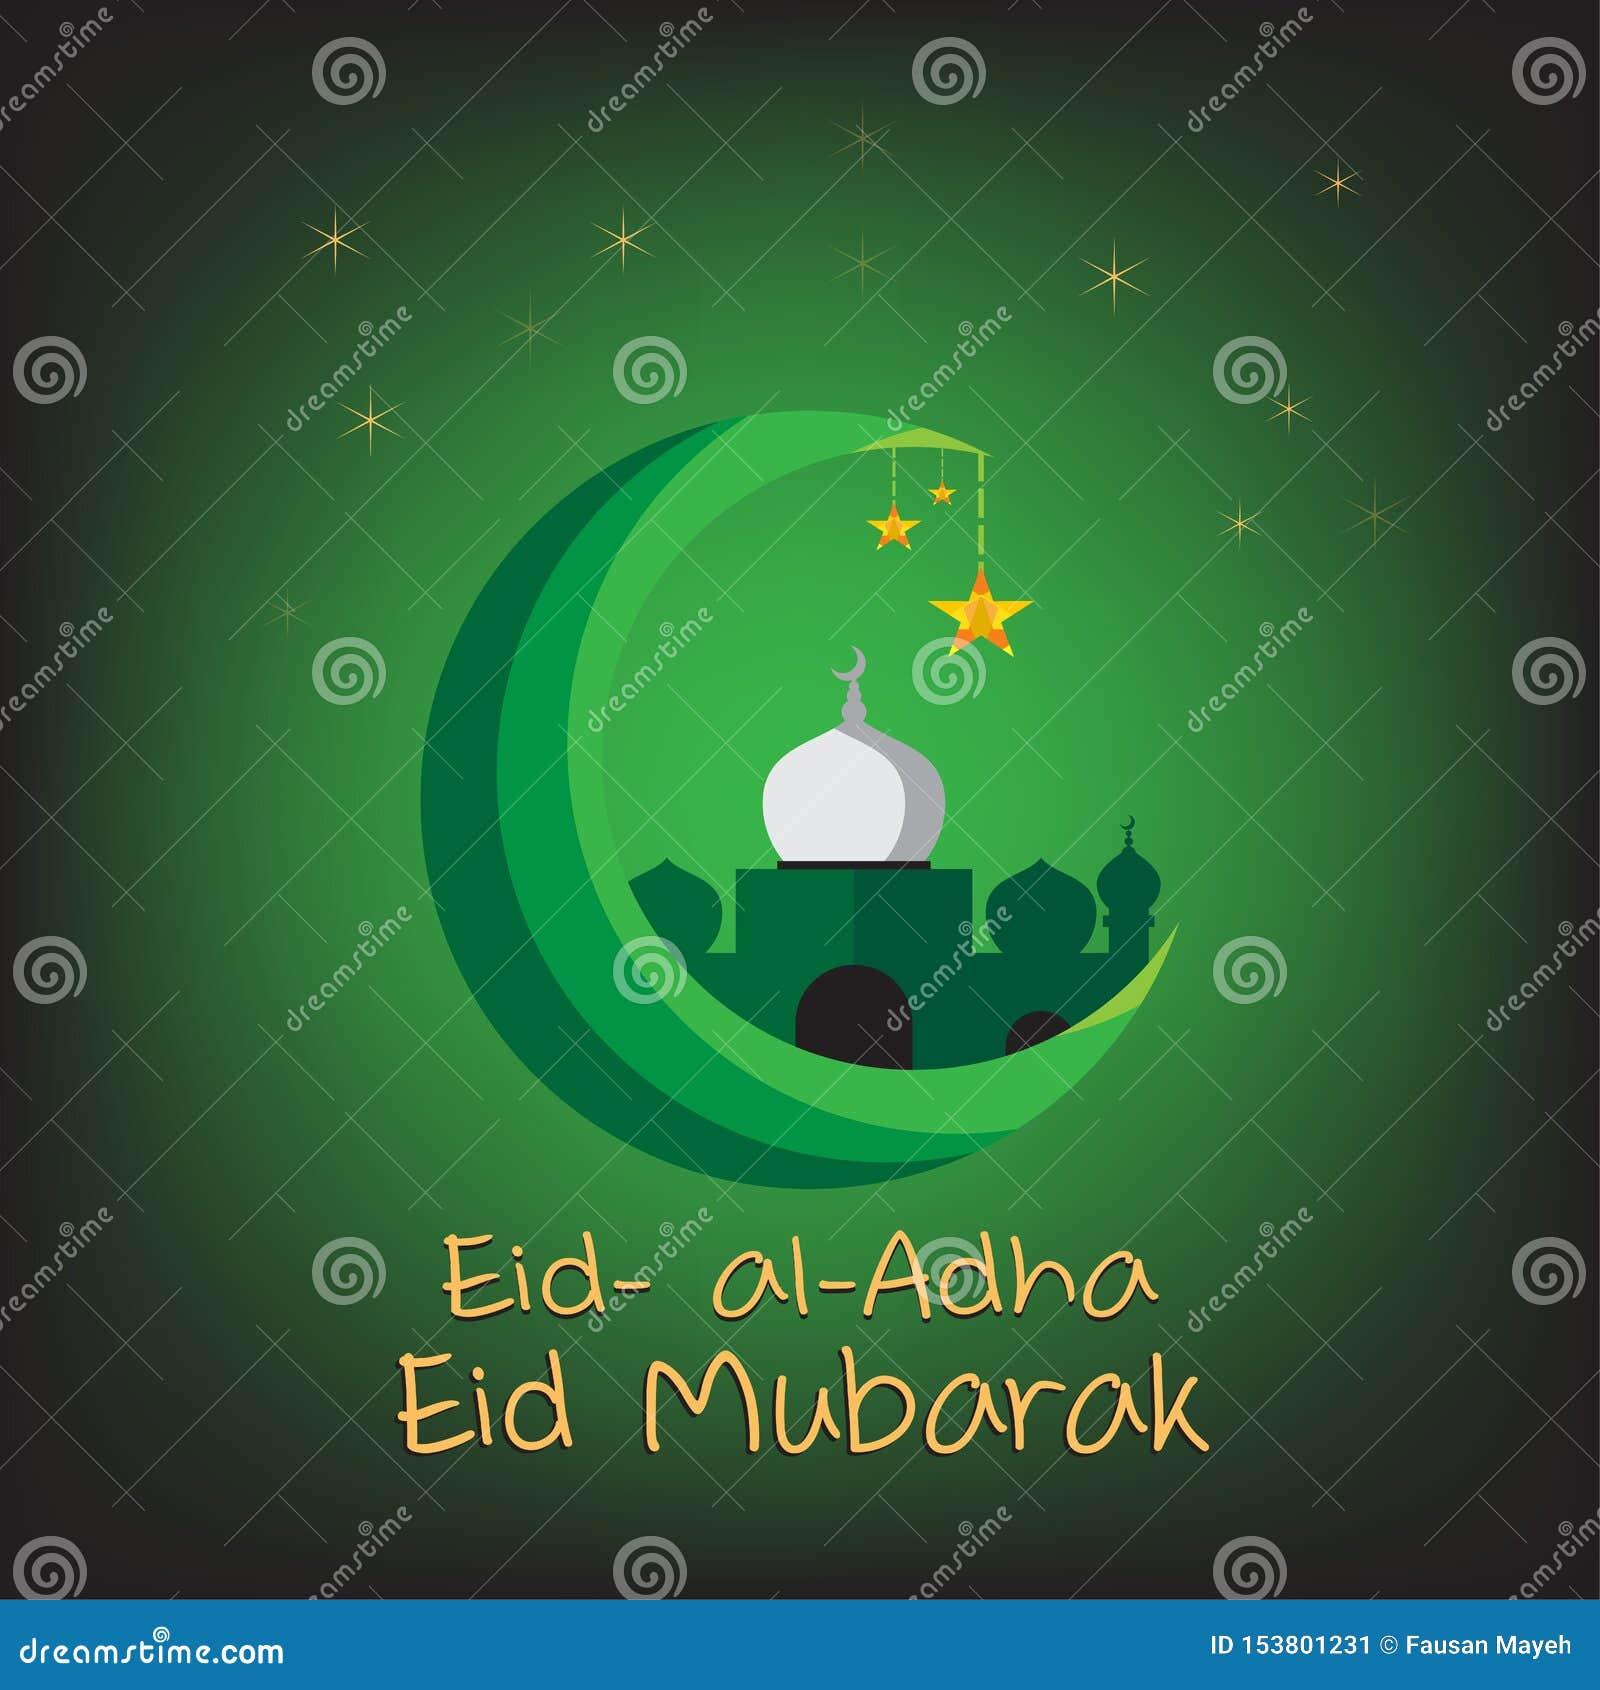 Vektorfeiertagsillustration von Eid al Adha, Eid Mubarak